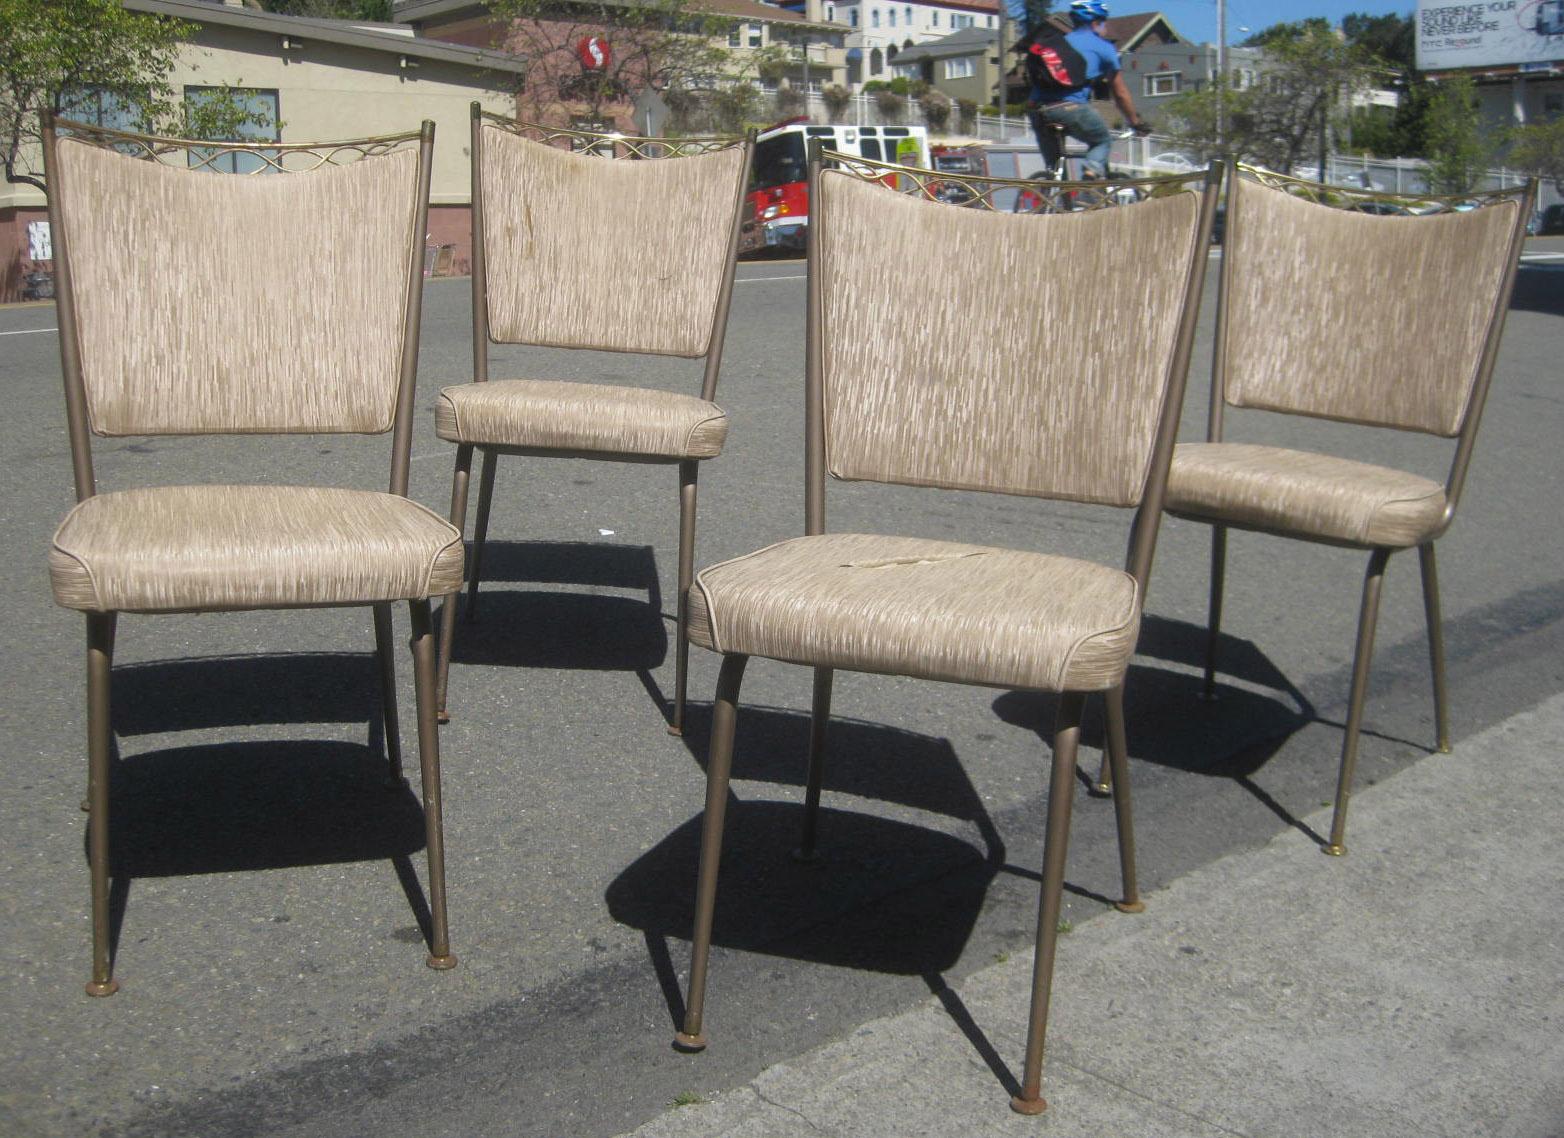 Retro Kitchen Chairs X Rocker Gaming Uk Uhuru Furniture And Collectibles Sold 4